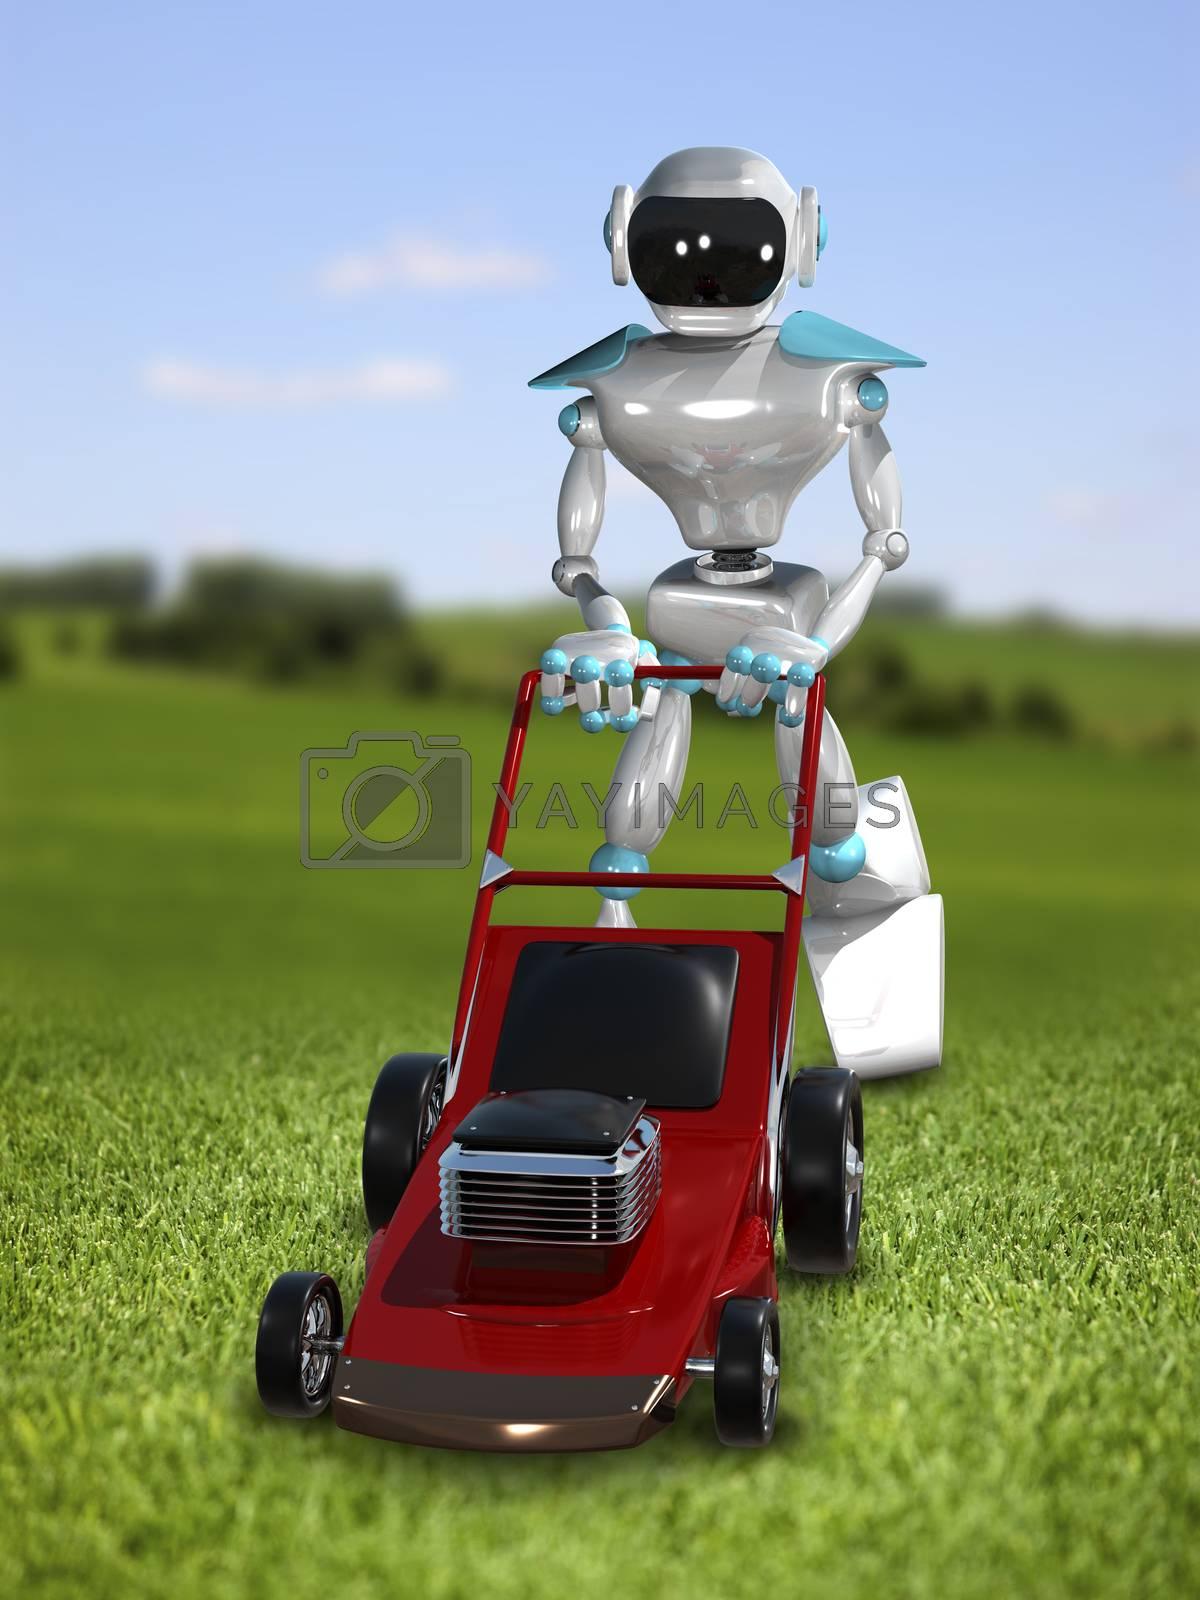 3D Illustration Robot Lawnmower  by brux